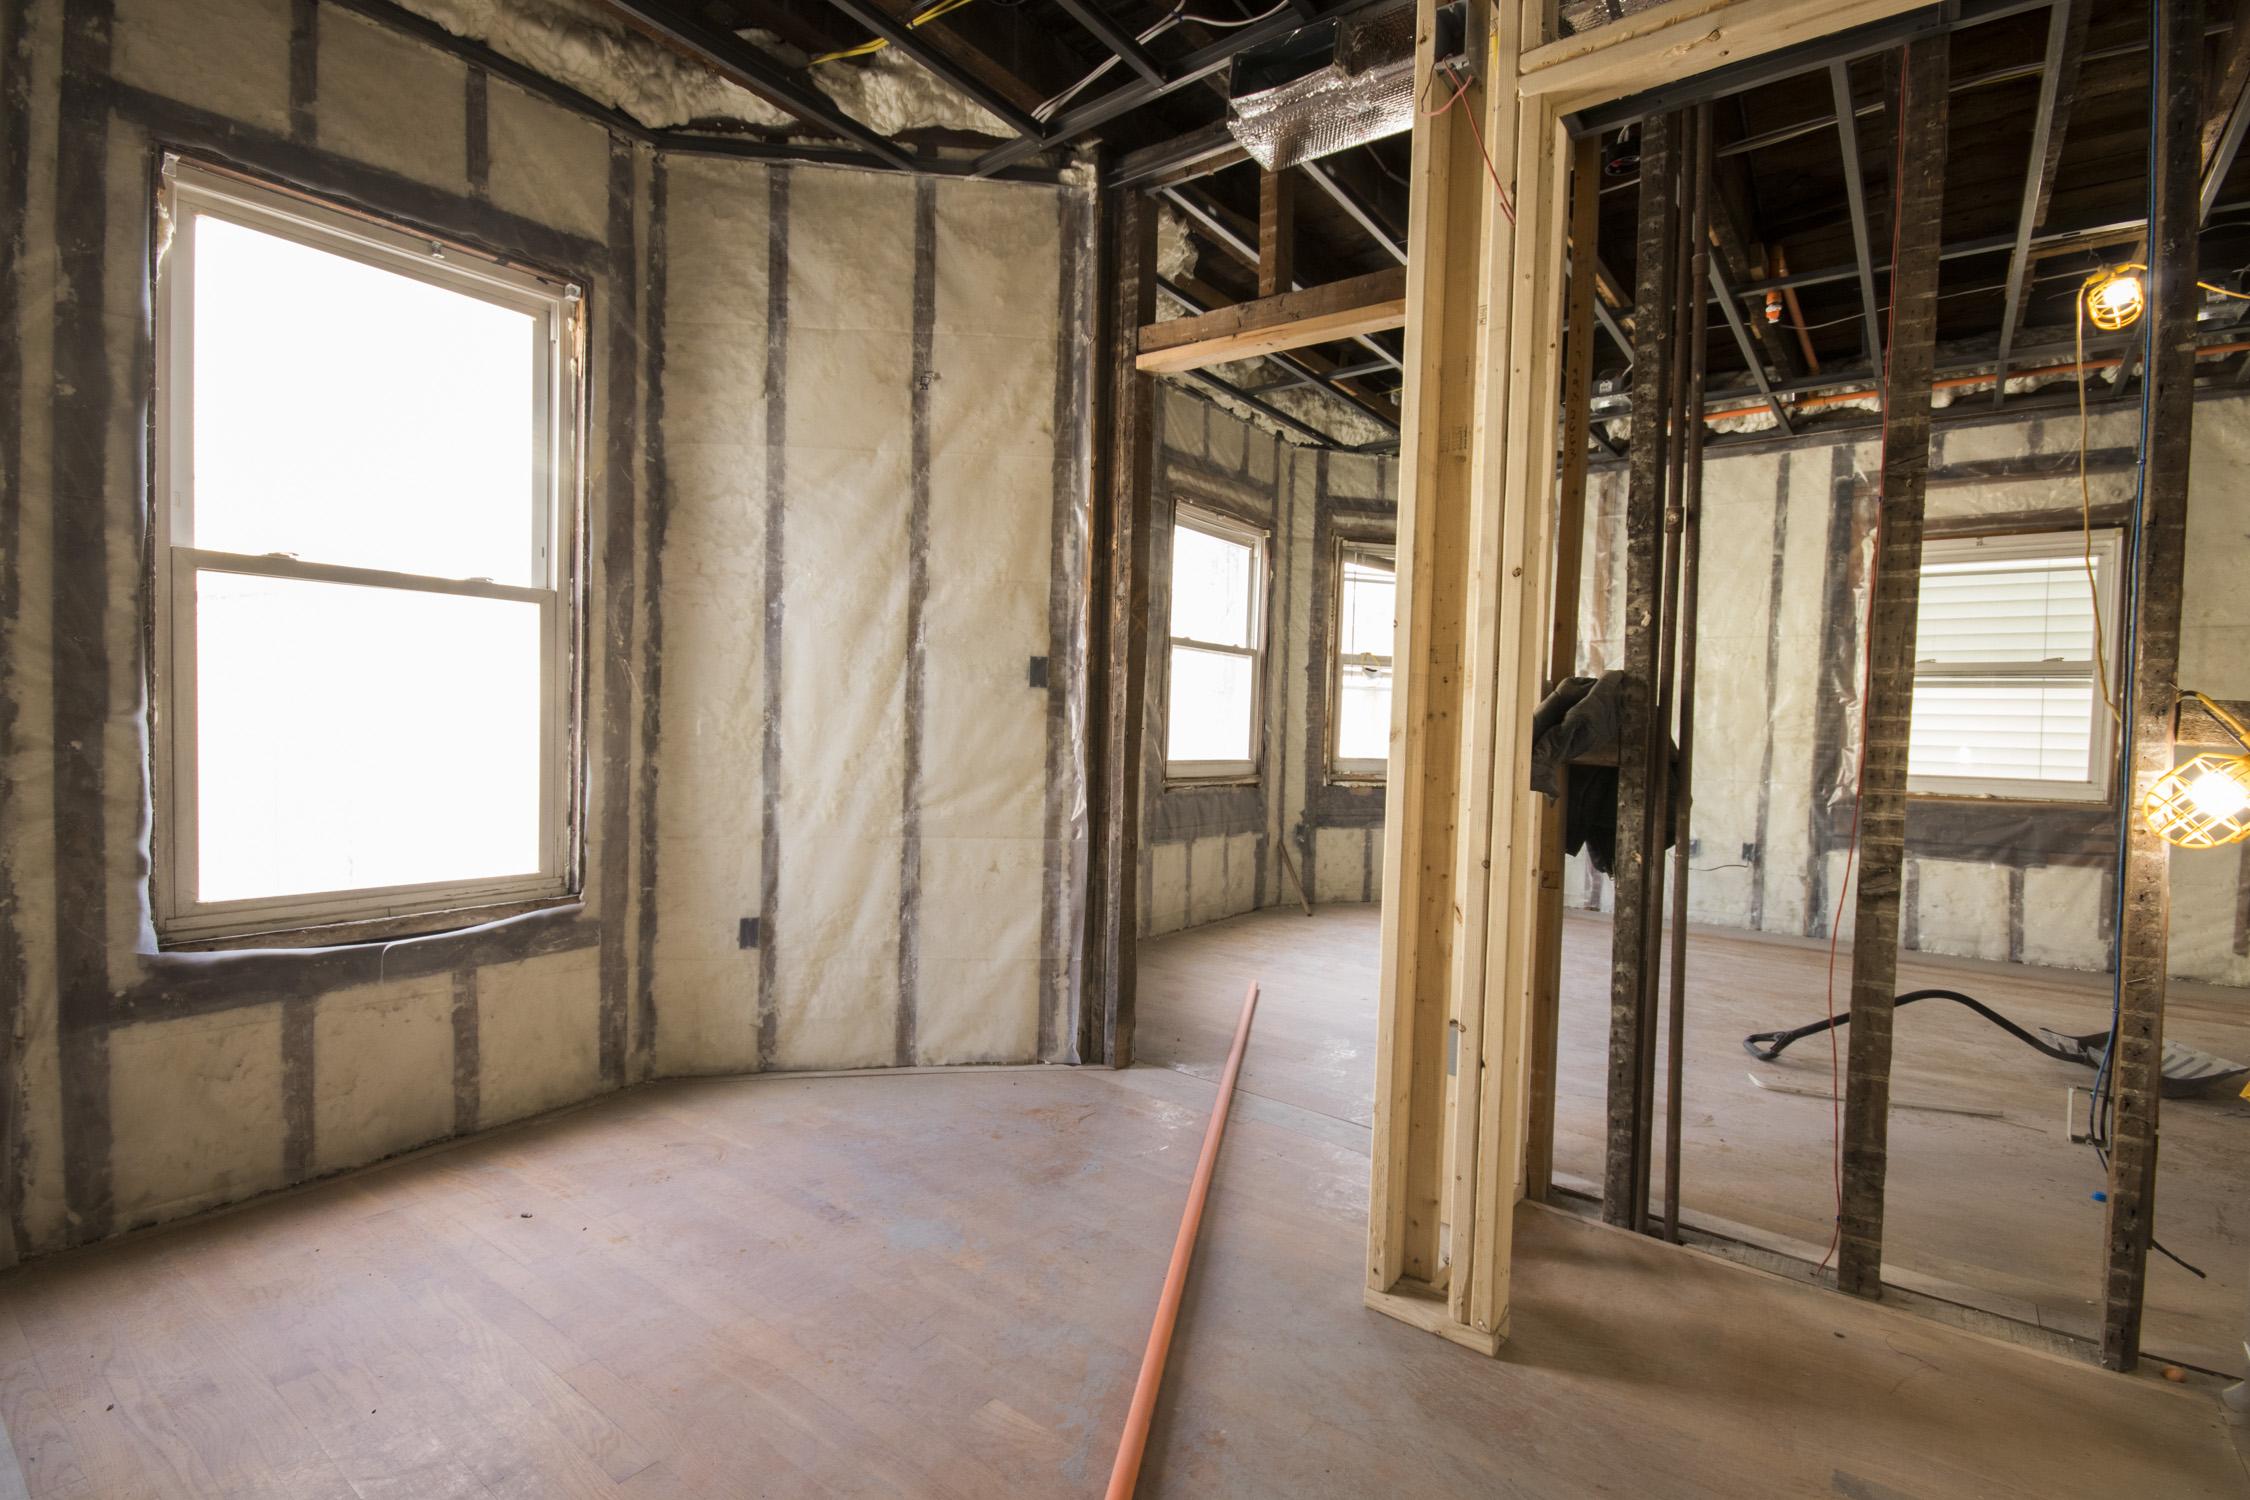 25 Darling Project P Northeast Contractors Boston General Contractors_143